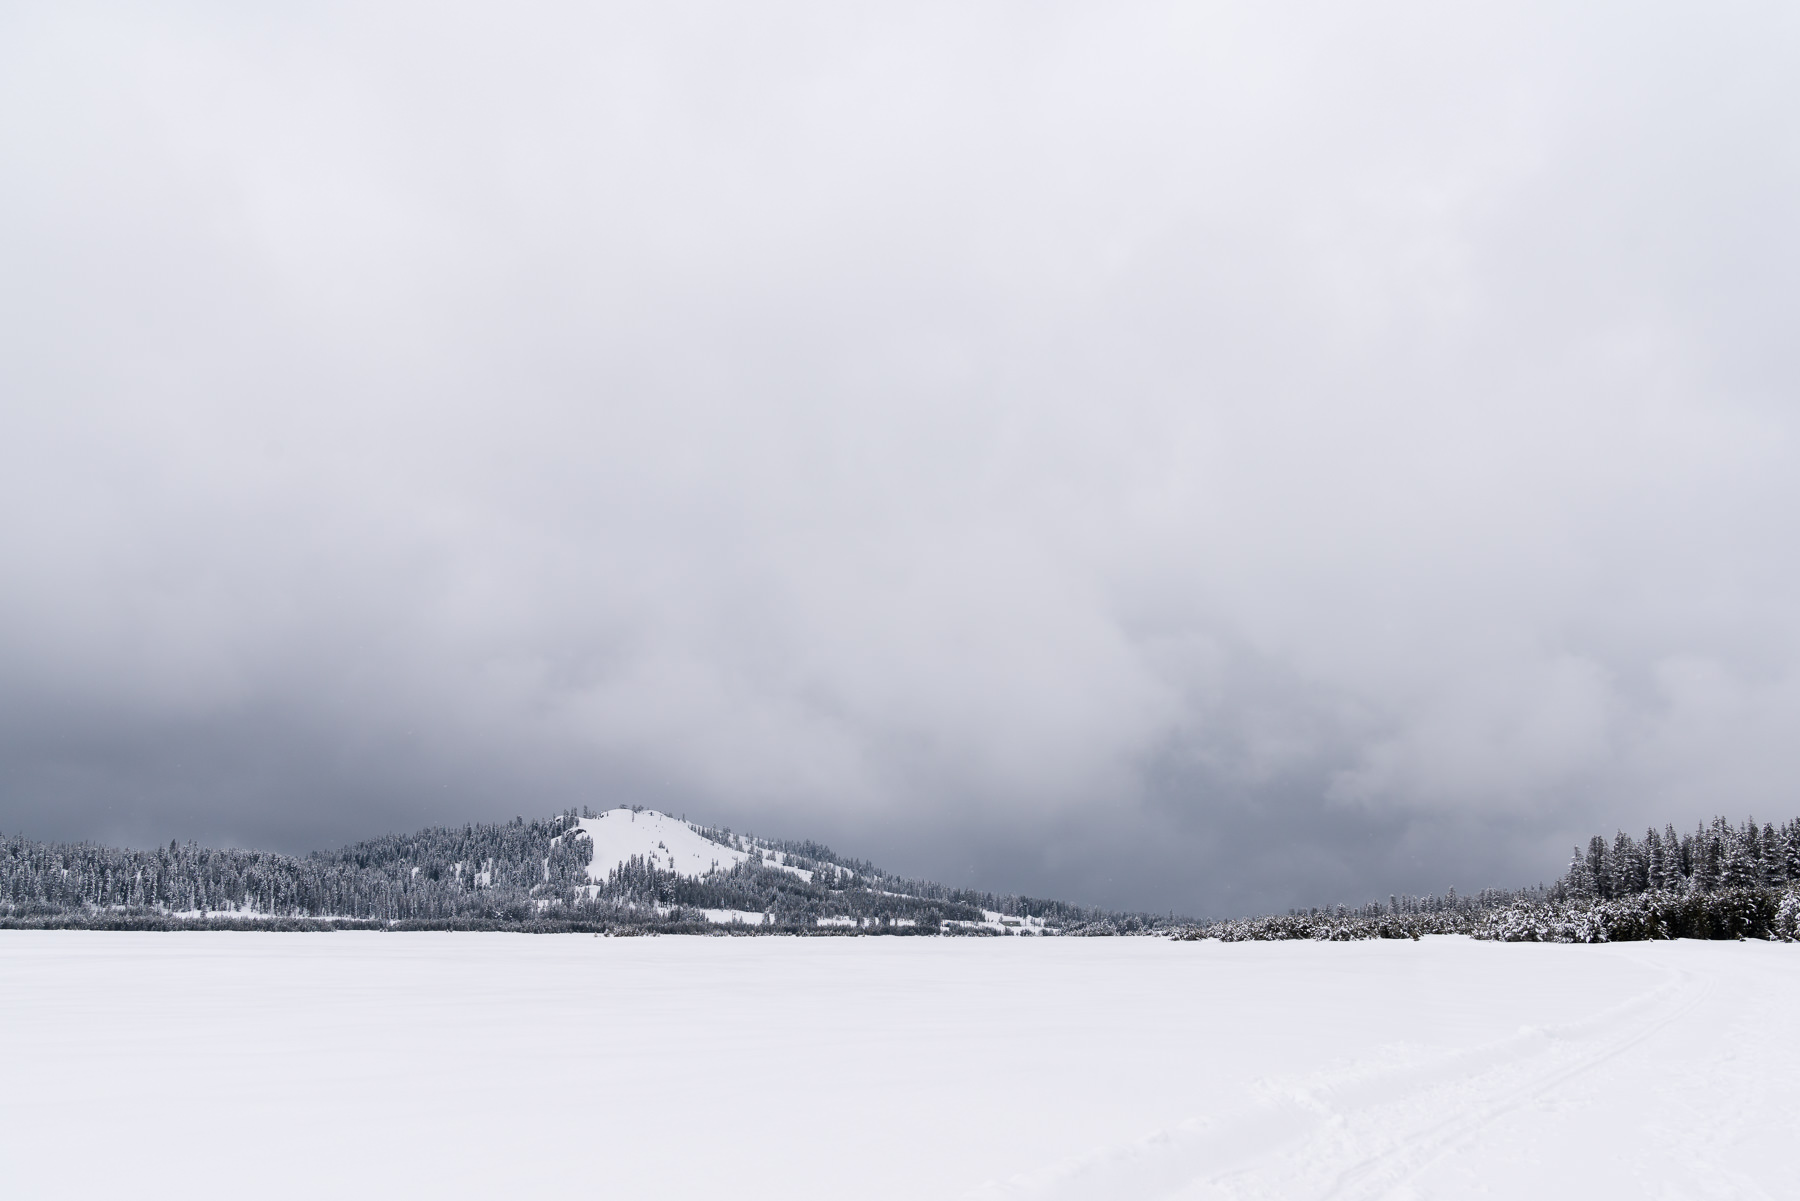 2019.03.23 Snowy Tahoe © Jennifer Carr Photography-22.jpg